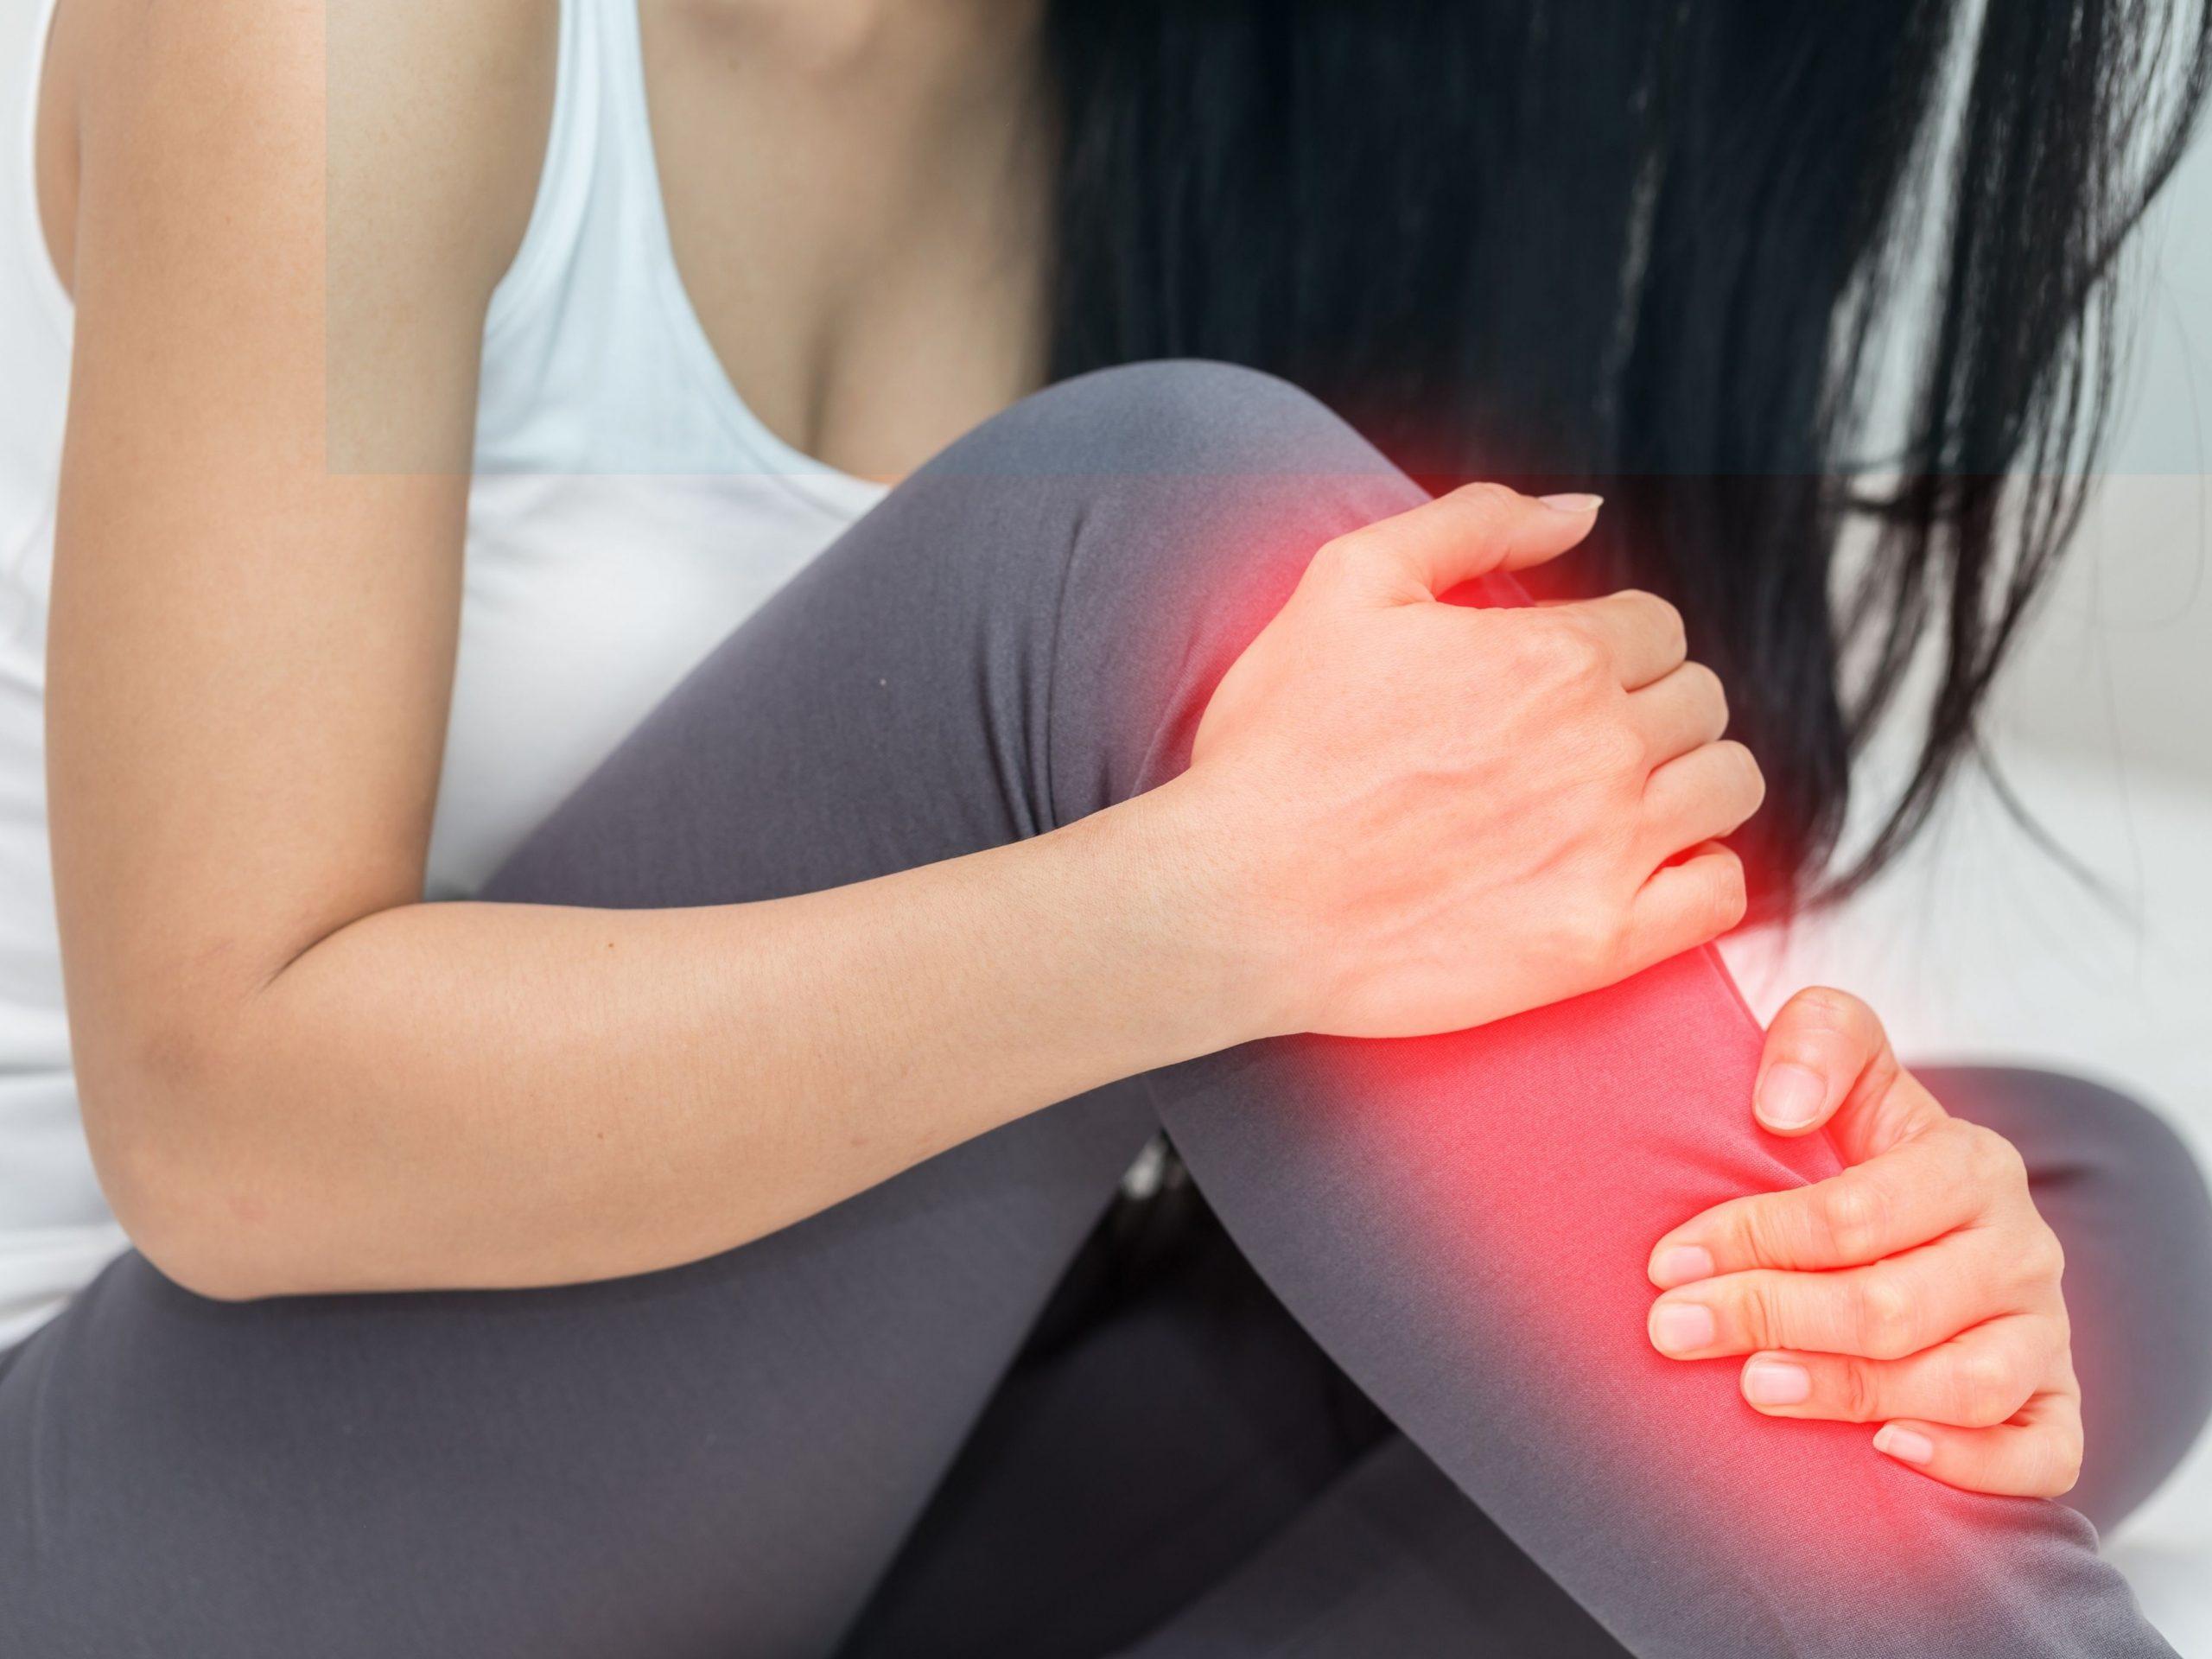 What to do for shin splints